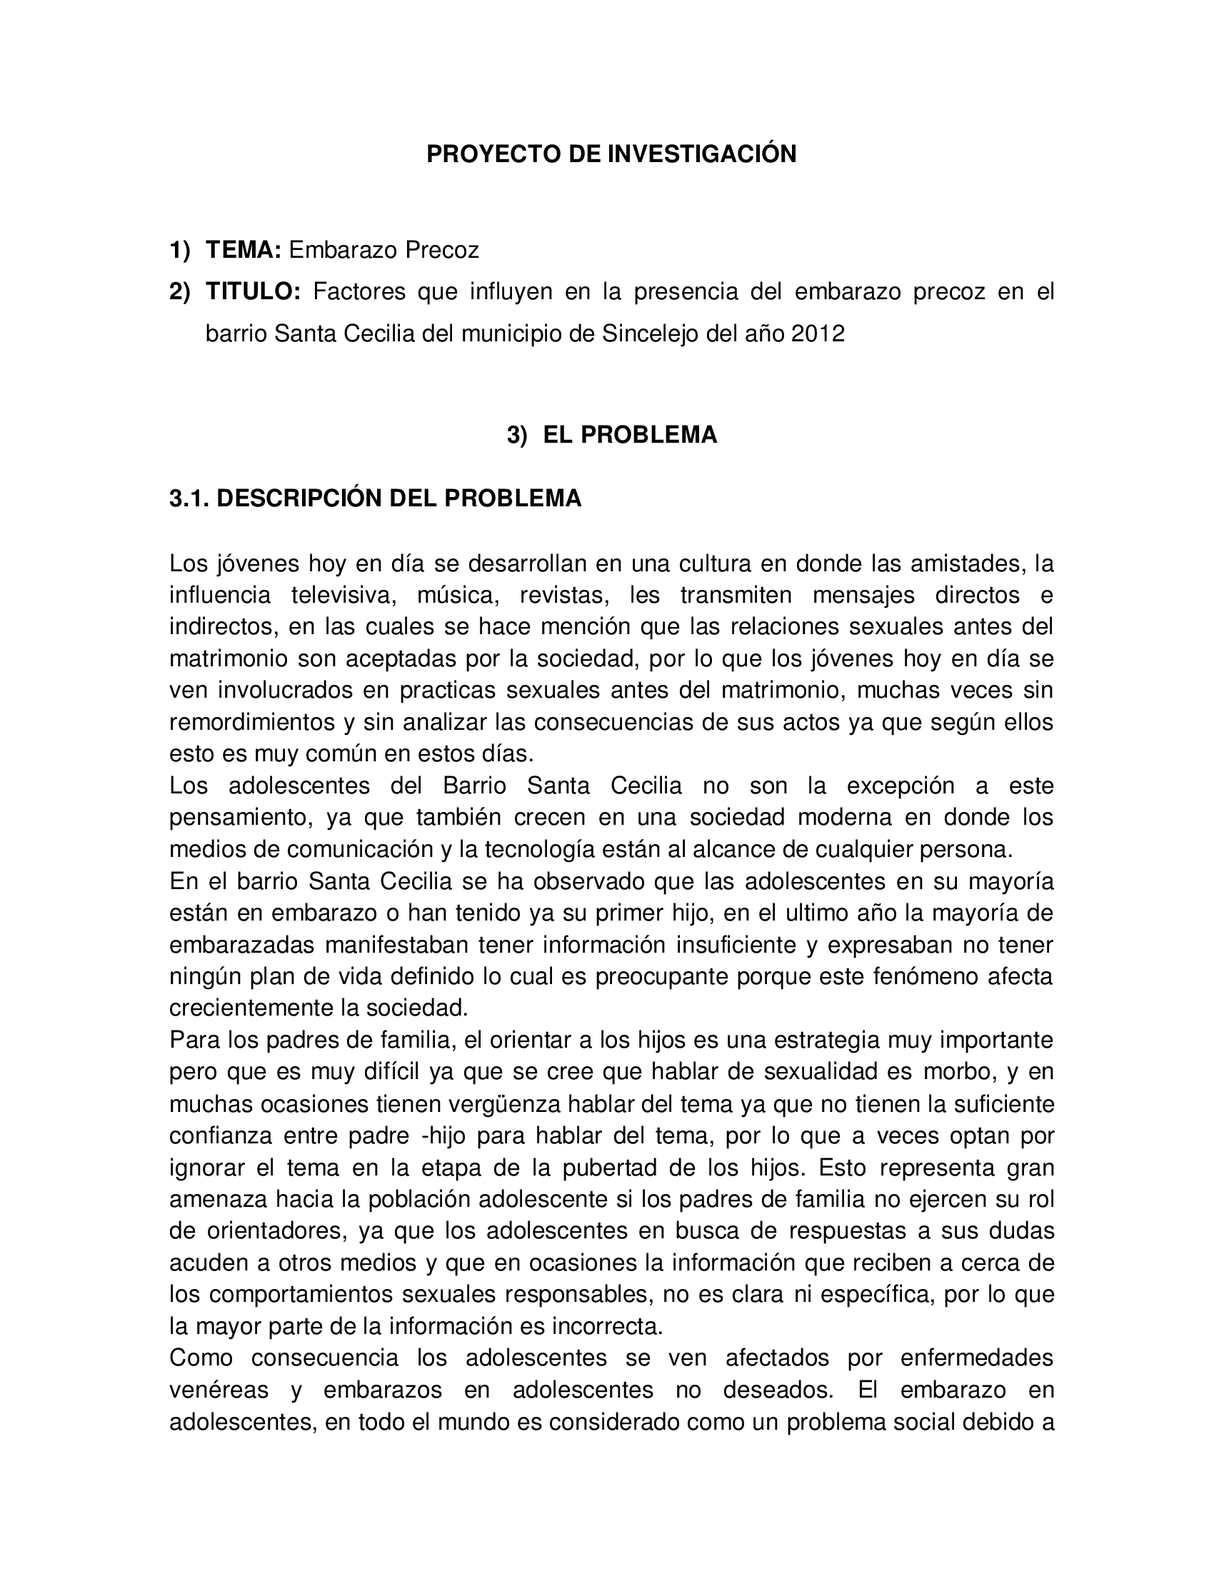 problema+de+investigacion+del+embarazo+precoz